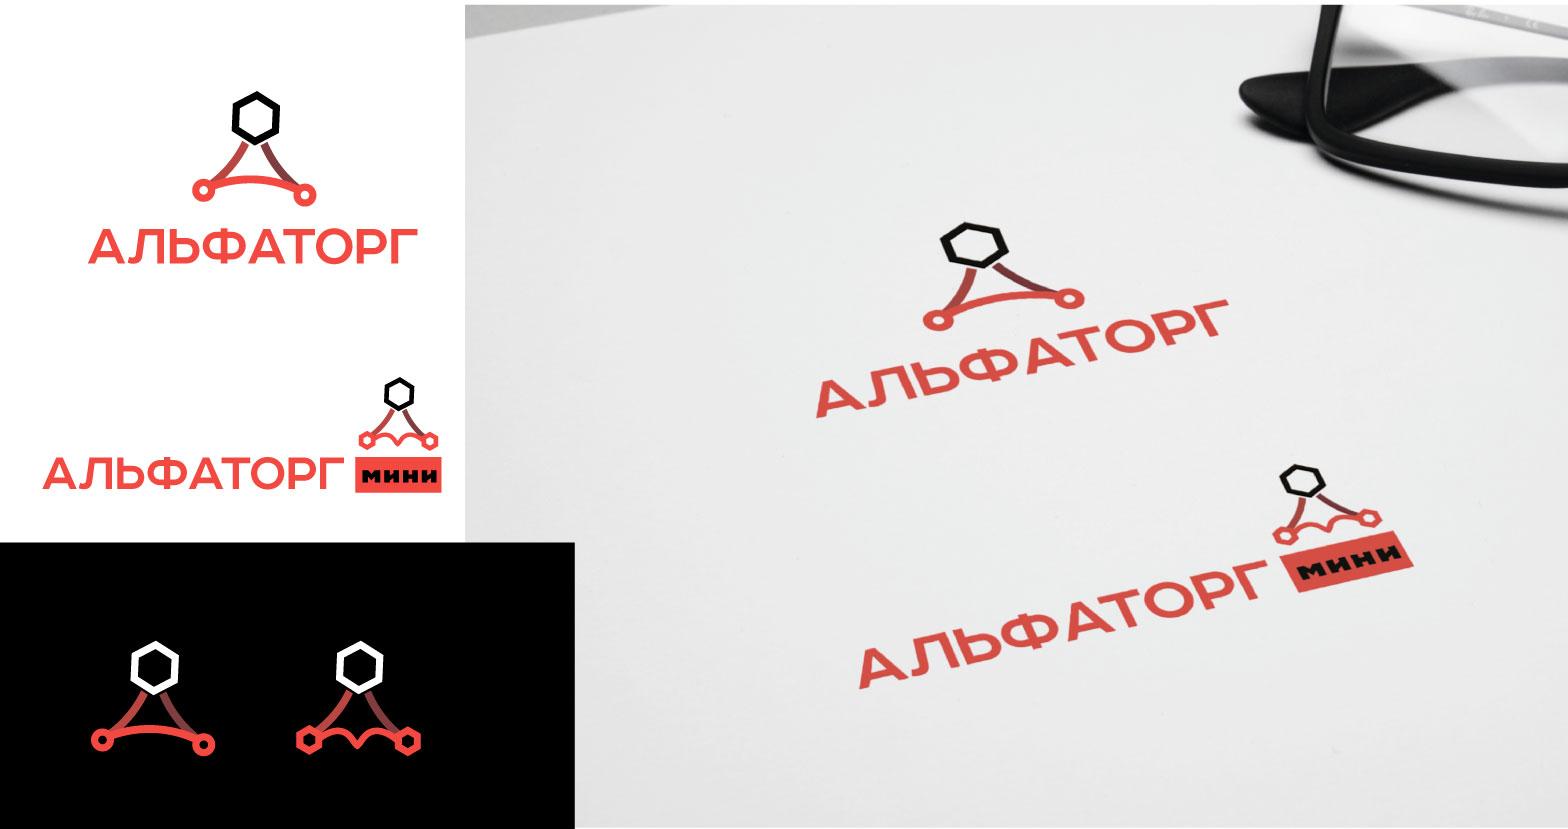 Логотип и фирменный стиль фото f_4055f0b798cd1da4.jpg